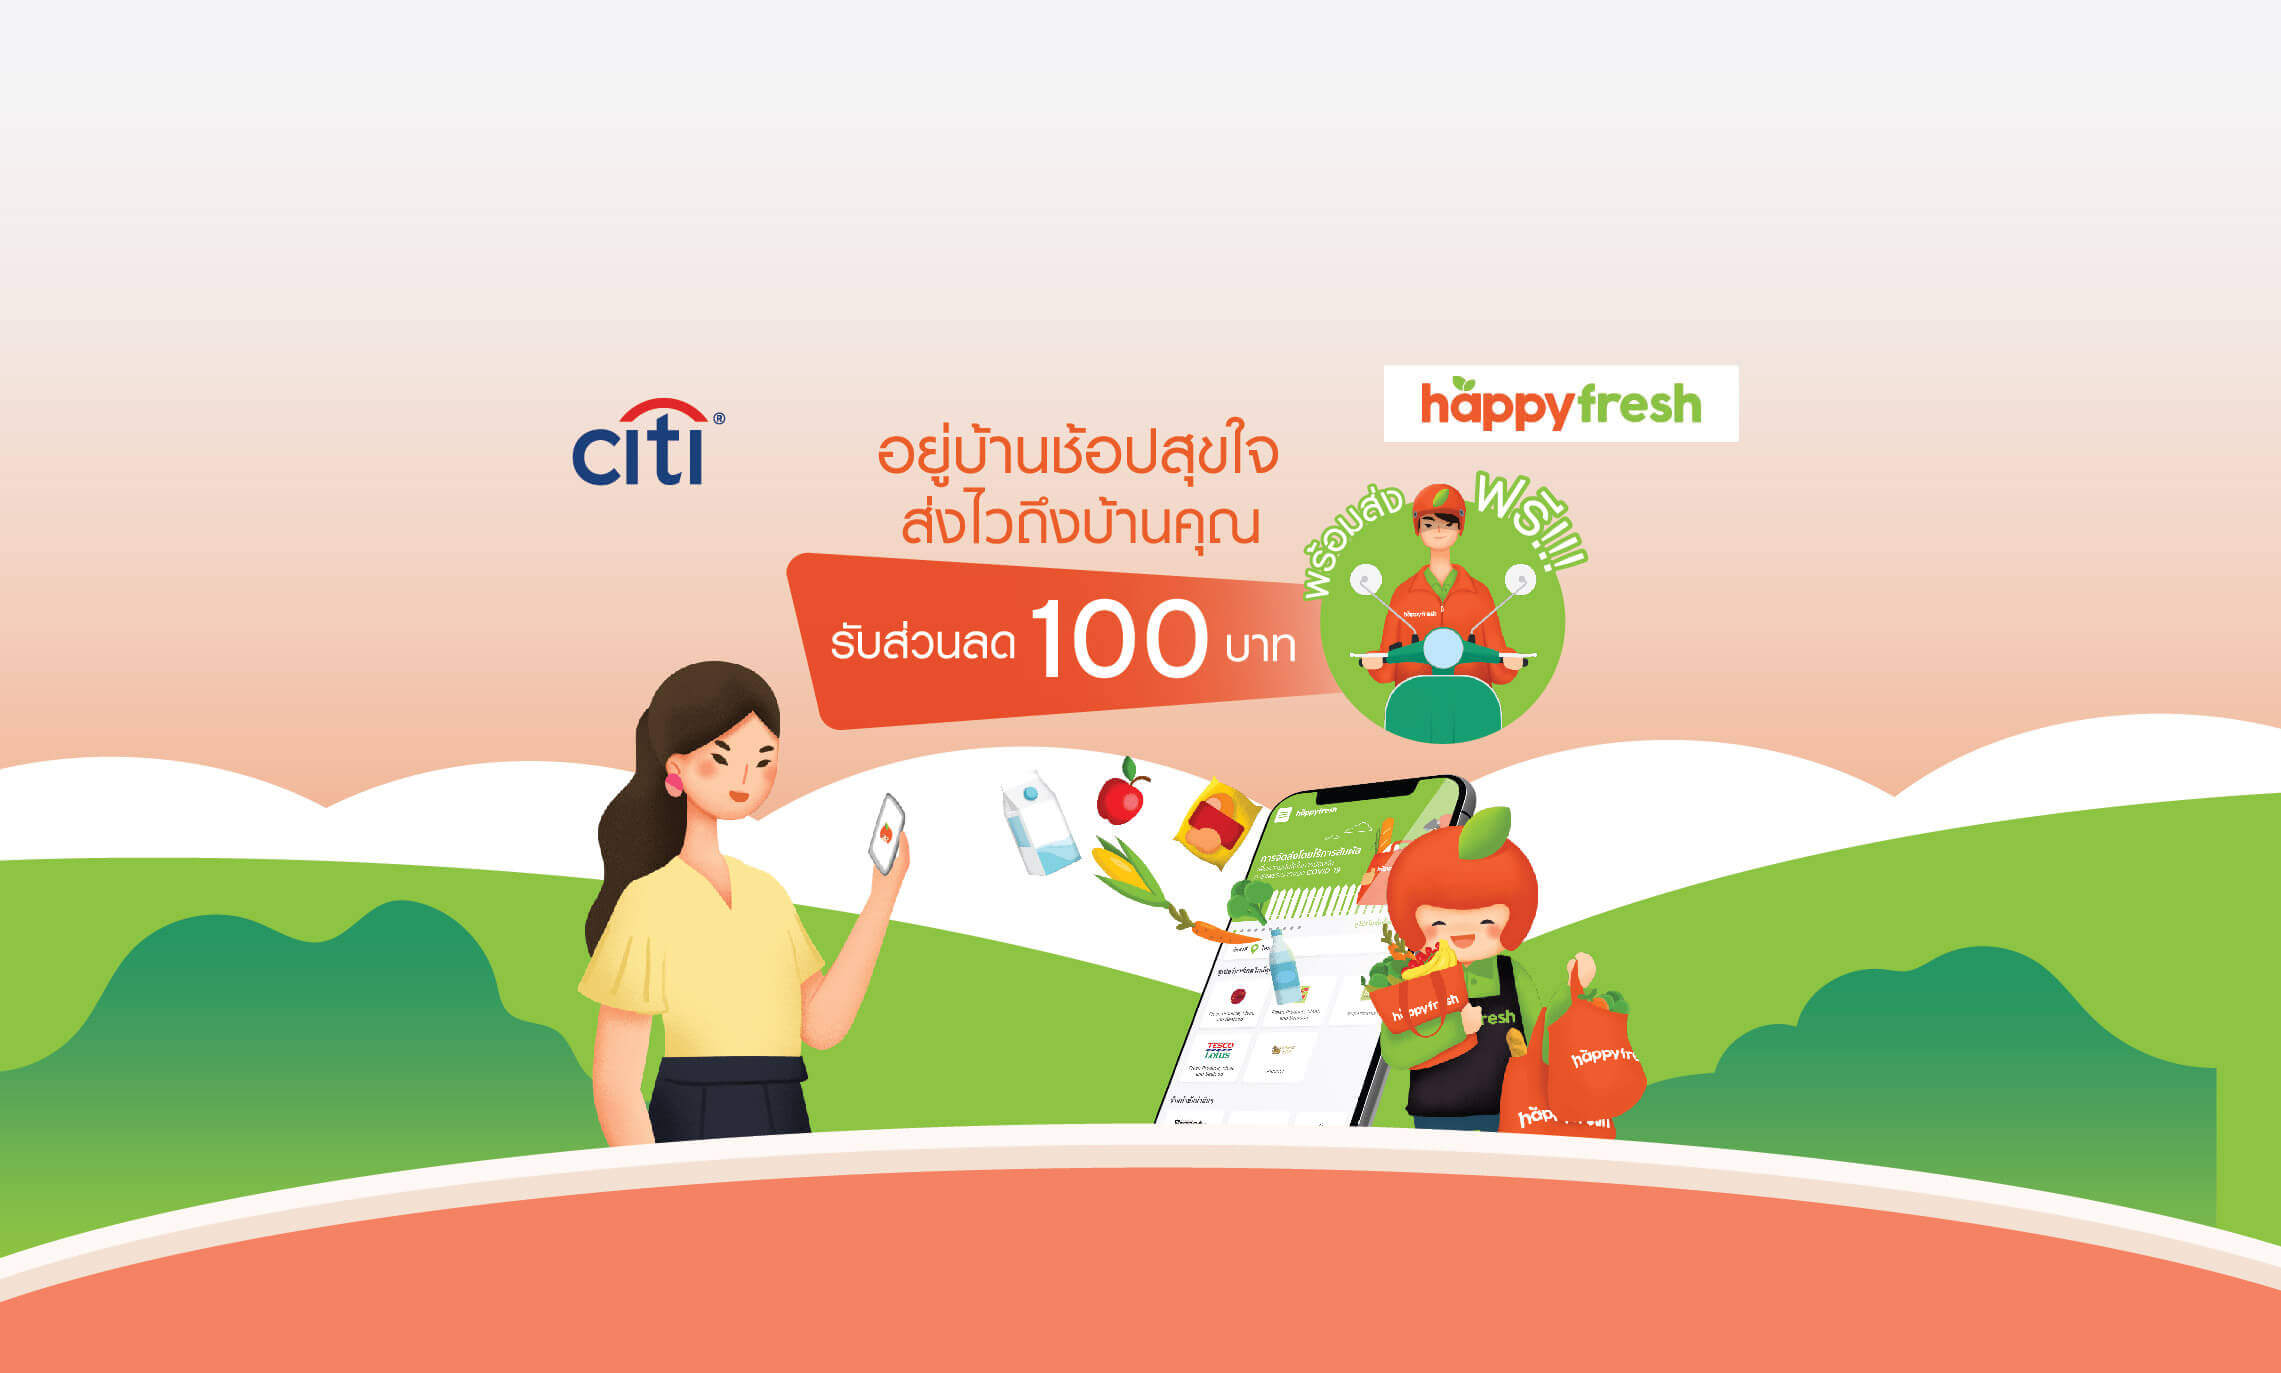 HappyFresh Feature Image โปรโมชั่นบัตรเครดิต Citibank 2564